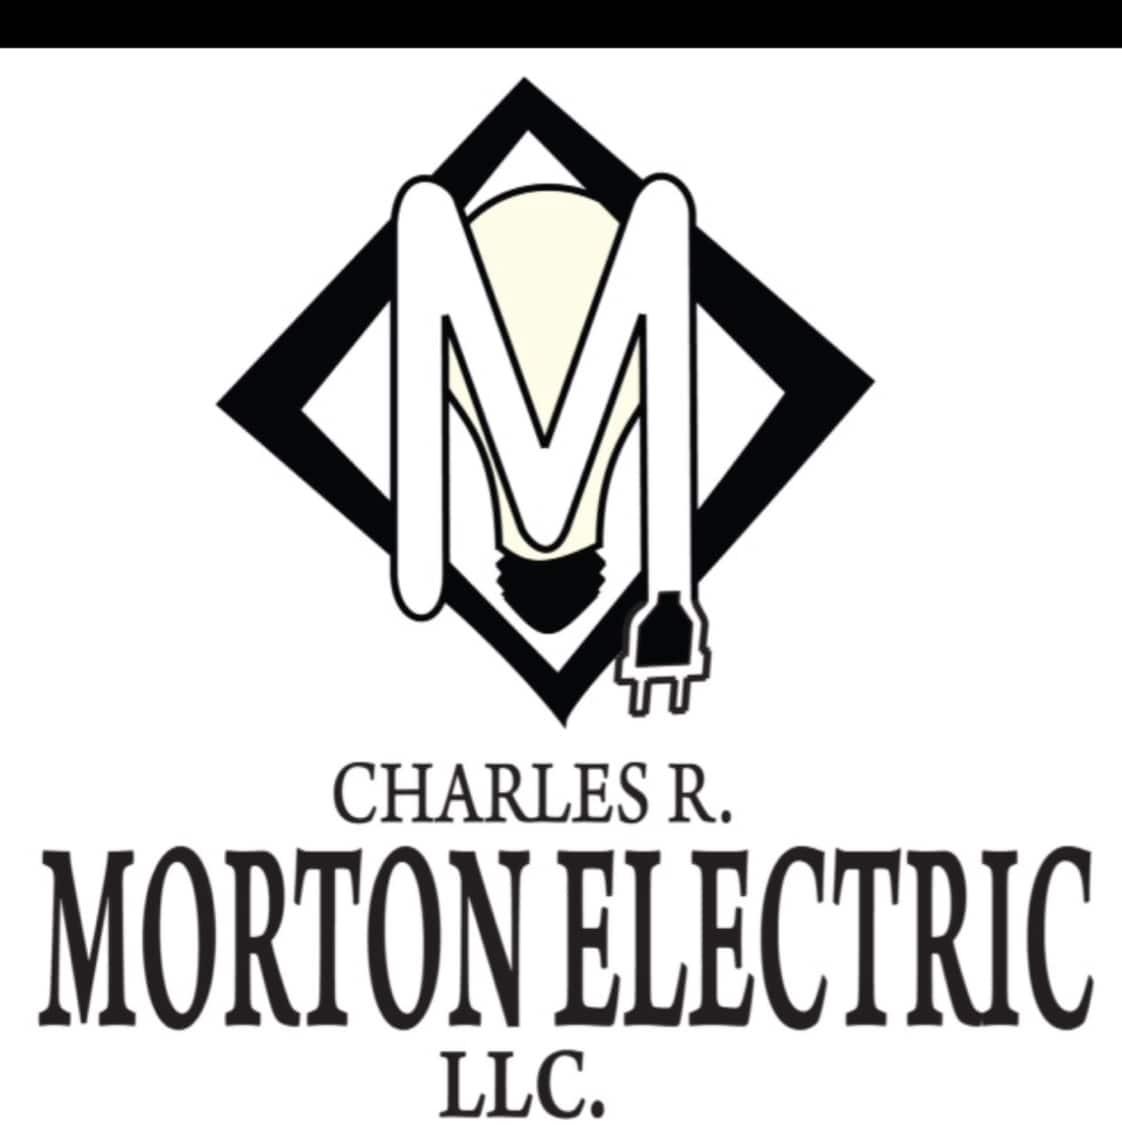 Charles R Morton Electric, LLC. logo